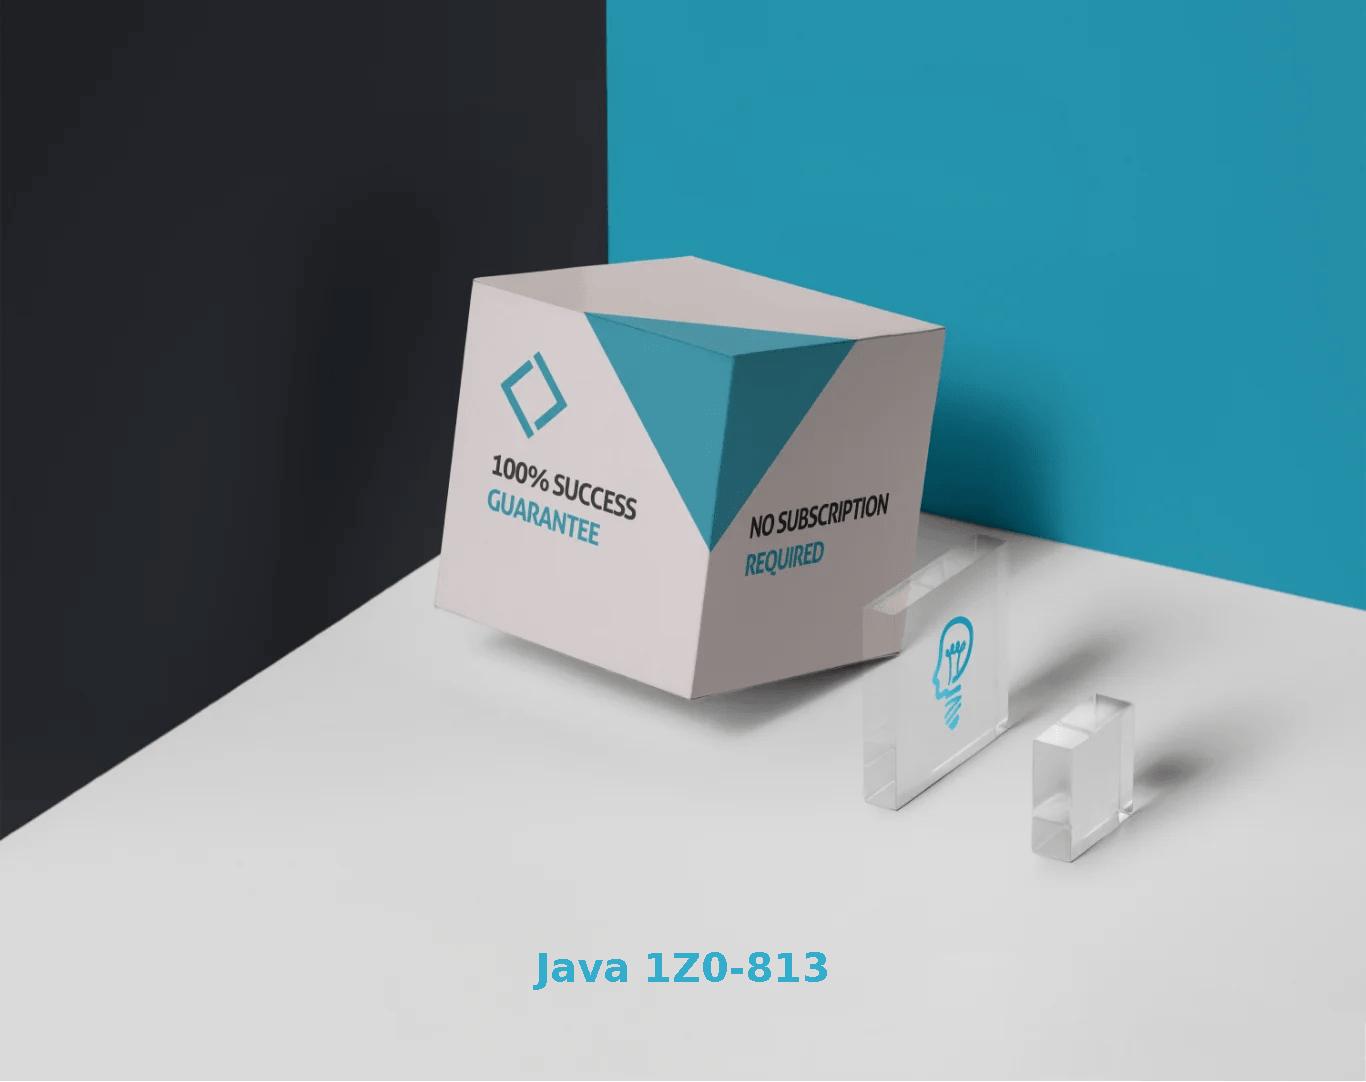 Java 1Z0-813 Exams